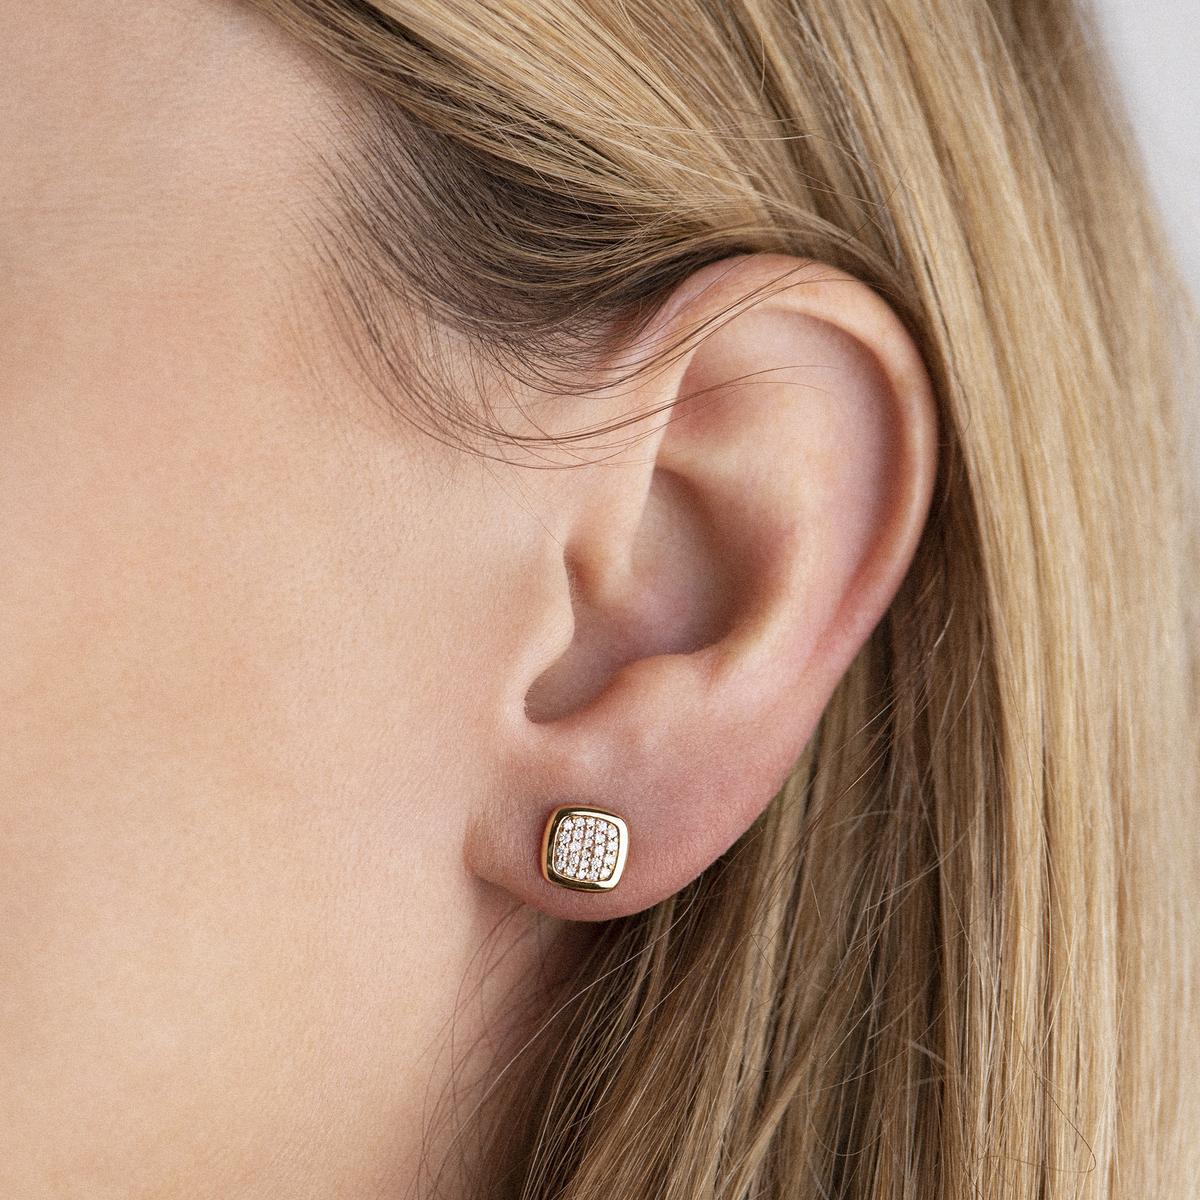 pantelleria earrings in rose gold